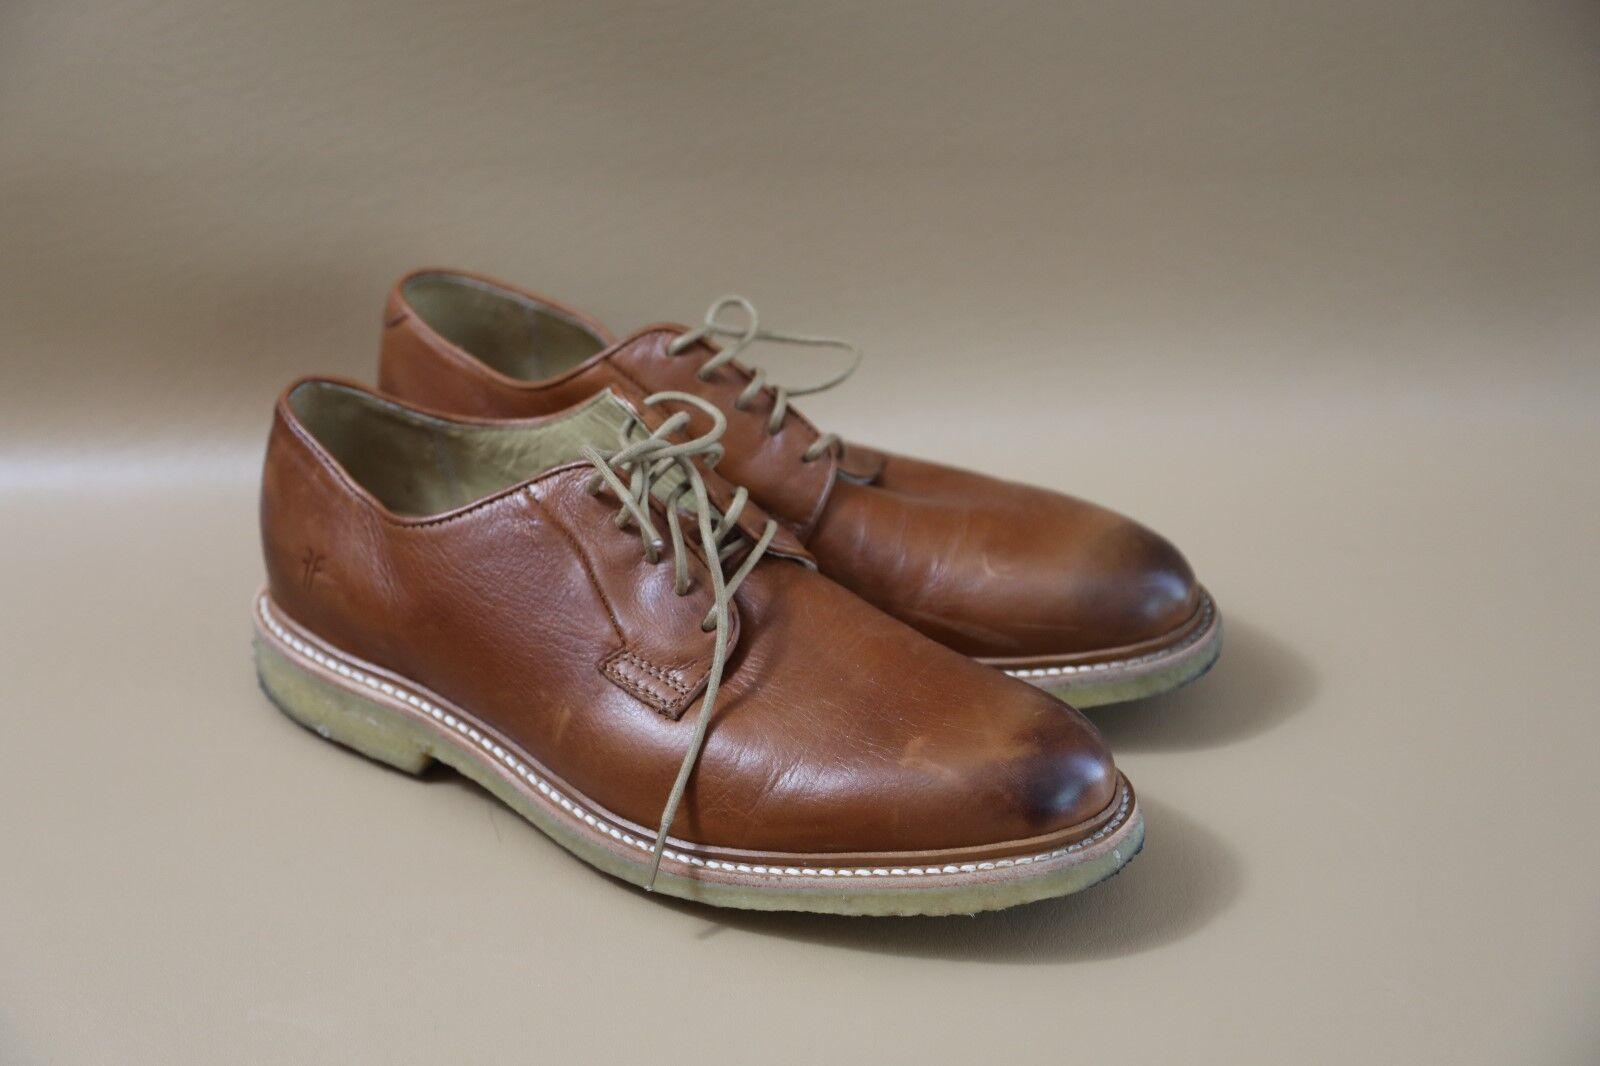 FRYE Para Hombre De Cuero Oxford Zapatos D Hecho En México